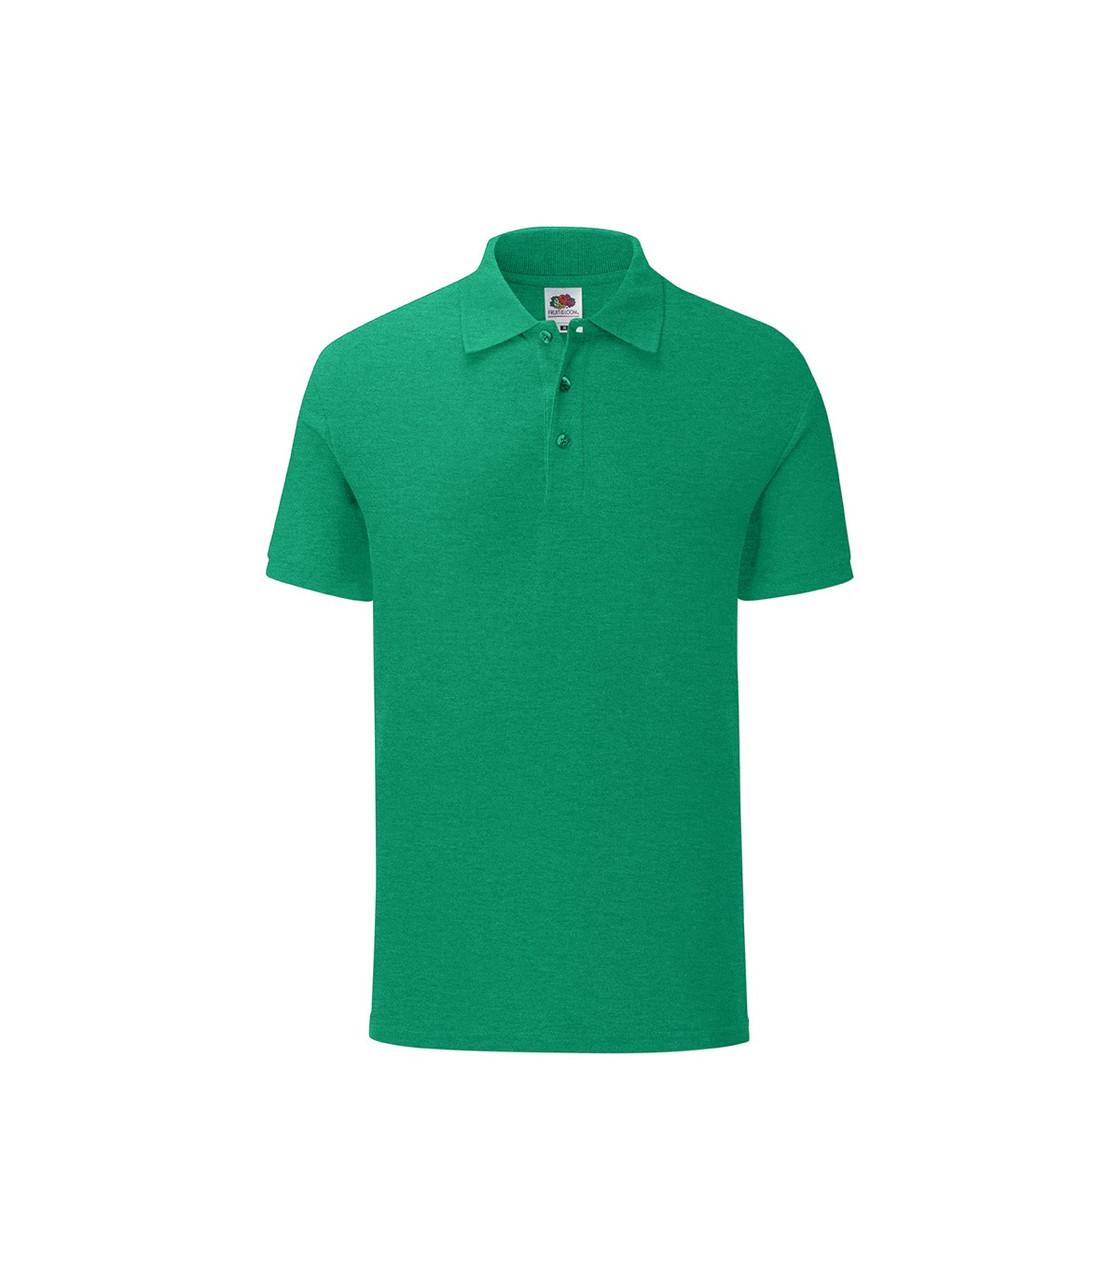 Мужская футболка поло хлопок зеленая меланж 044-RX